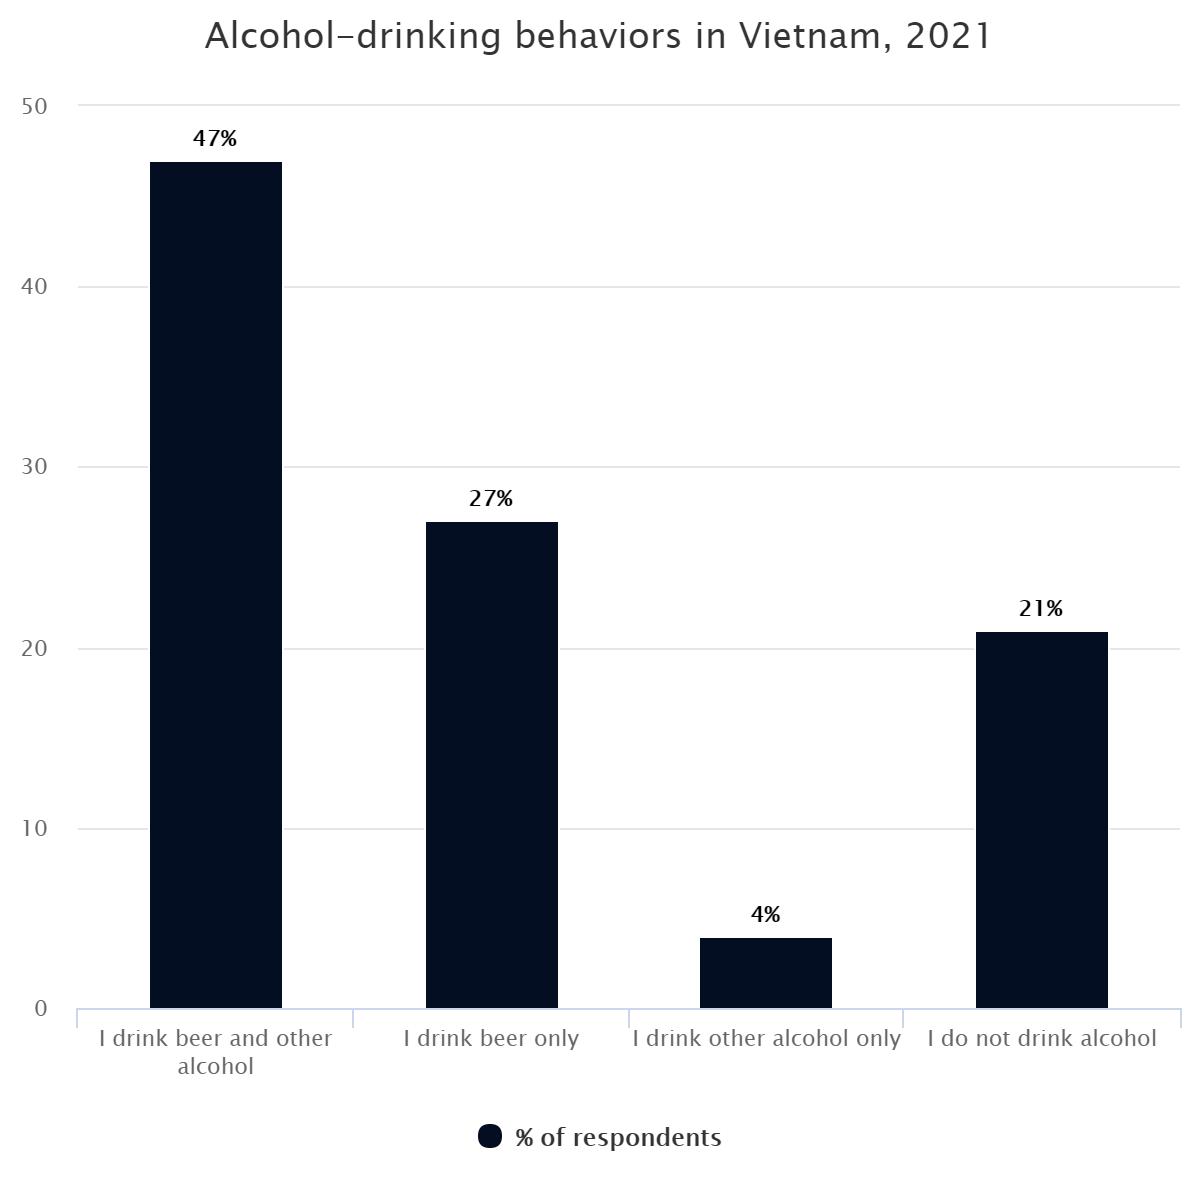 Alcohol-drinking behaviors in Vietnam, 2021